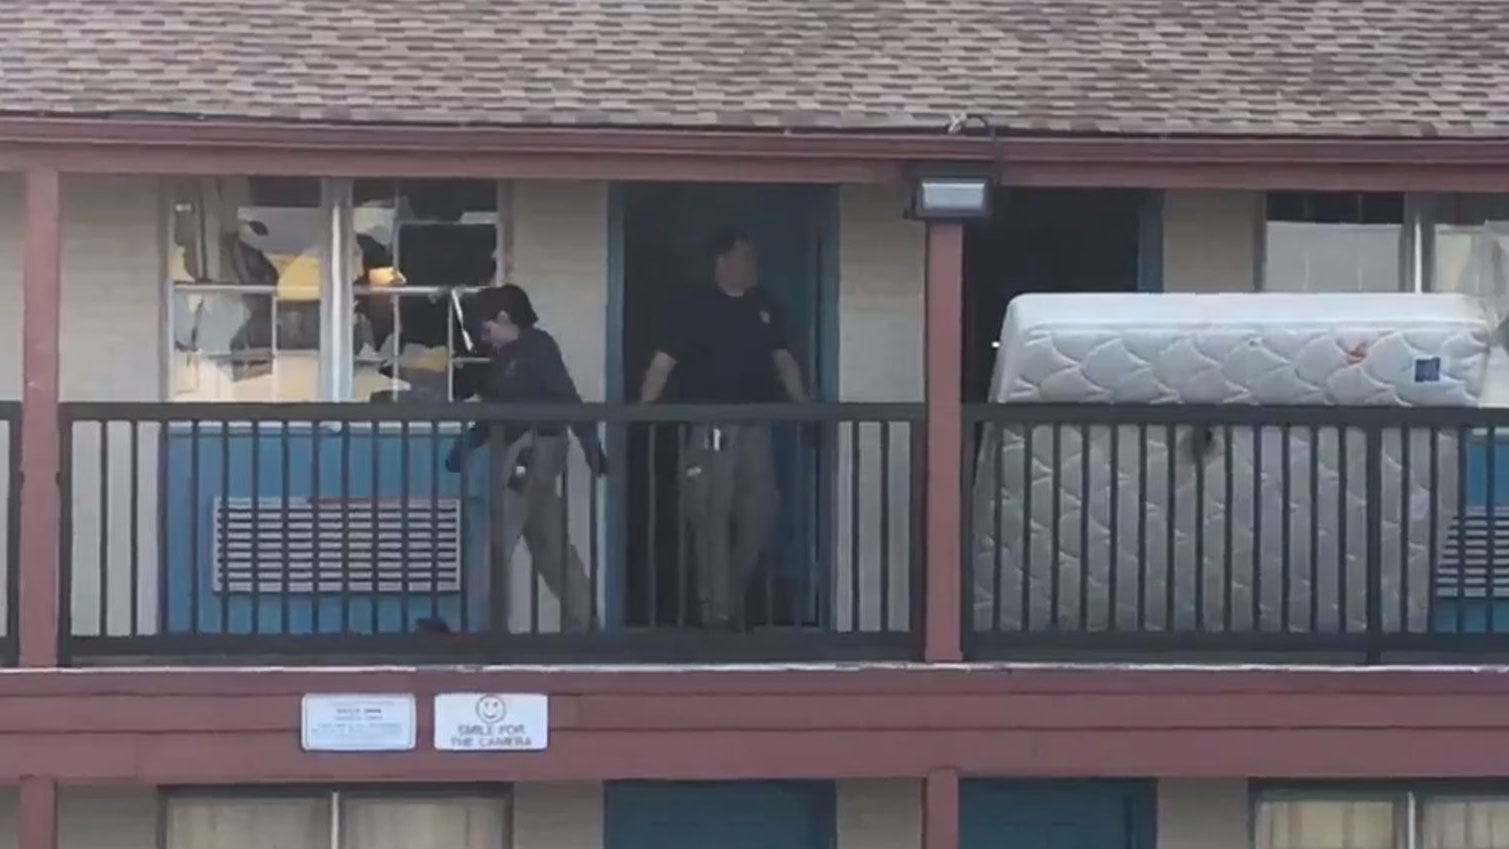 Motel Neighbor Traumatized After Tulsa Standoff